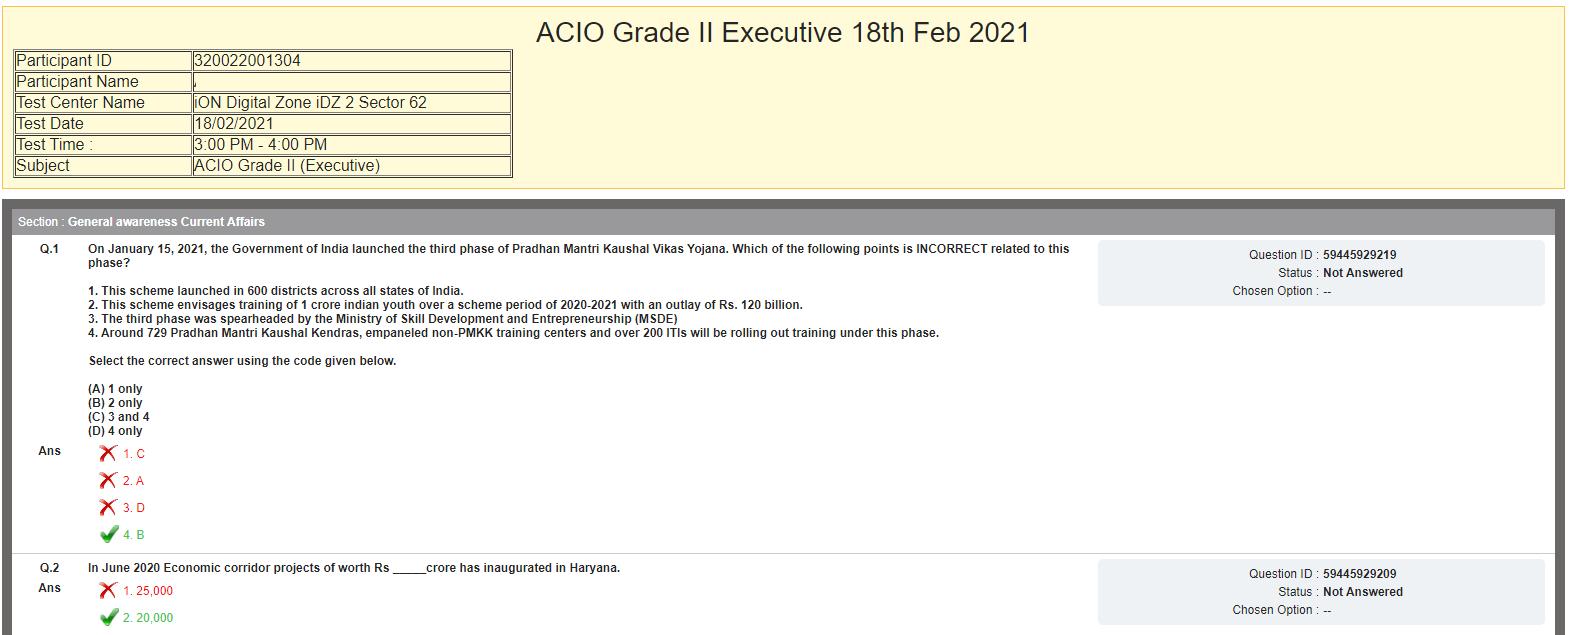 IB ACIO Answer Key 2021 जारी : जानिए कैसे करें IB ACIO Answer Key की जाँच(how to download IB ACIO Answer Key)_70.1